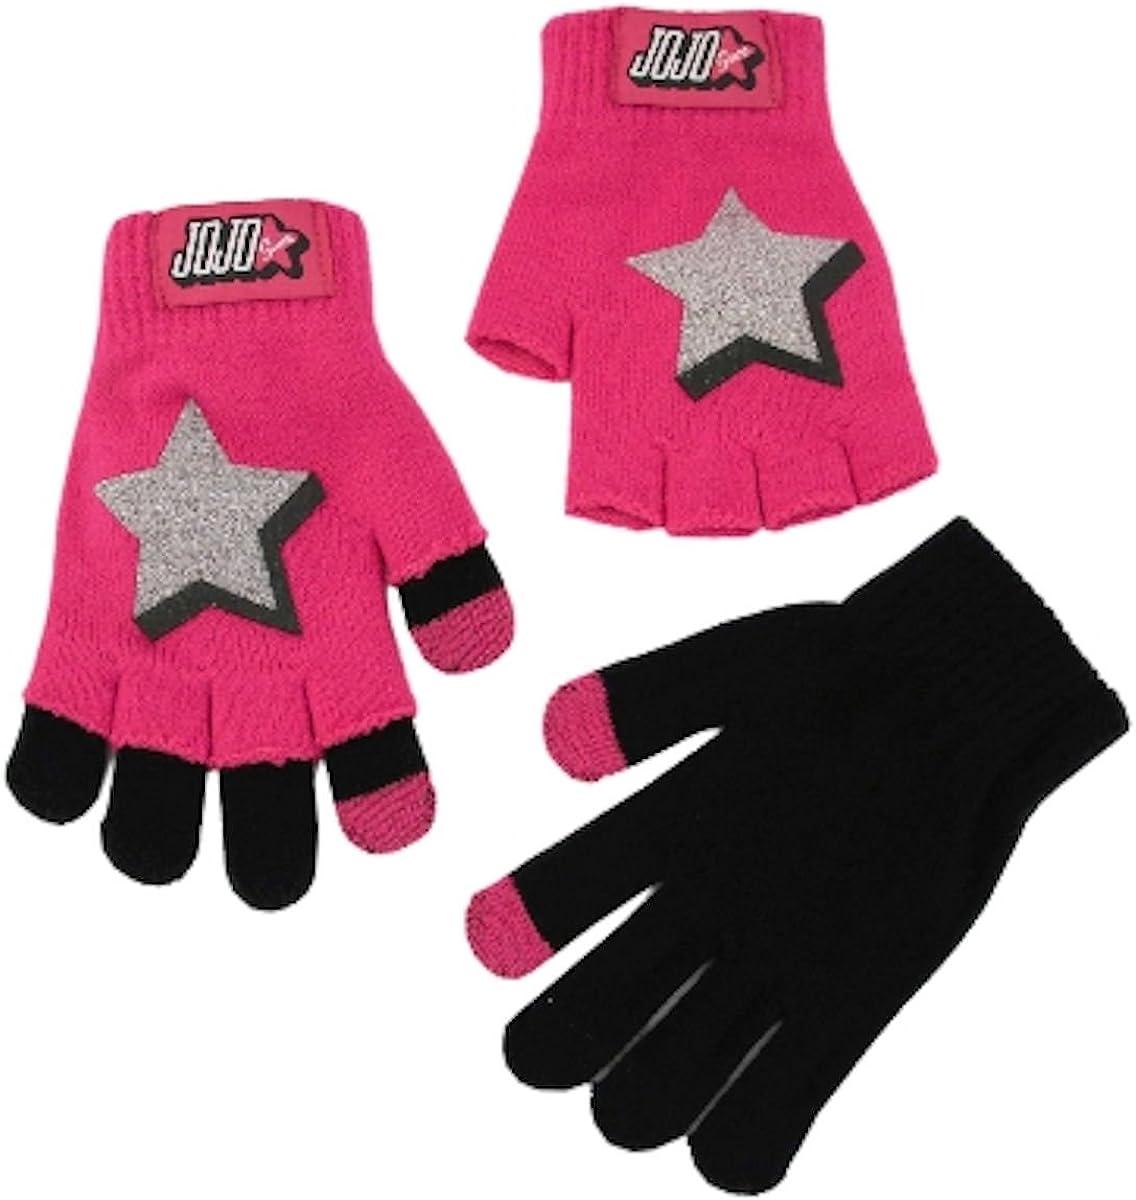 JoJo Siwa Girls Star 2-in-1 Knit Gloves